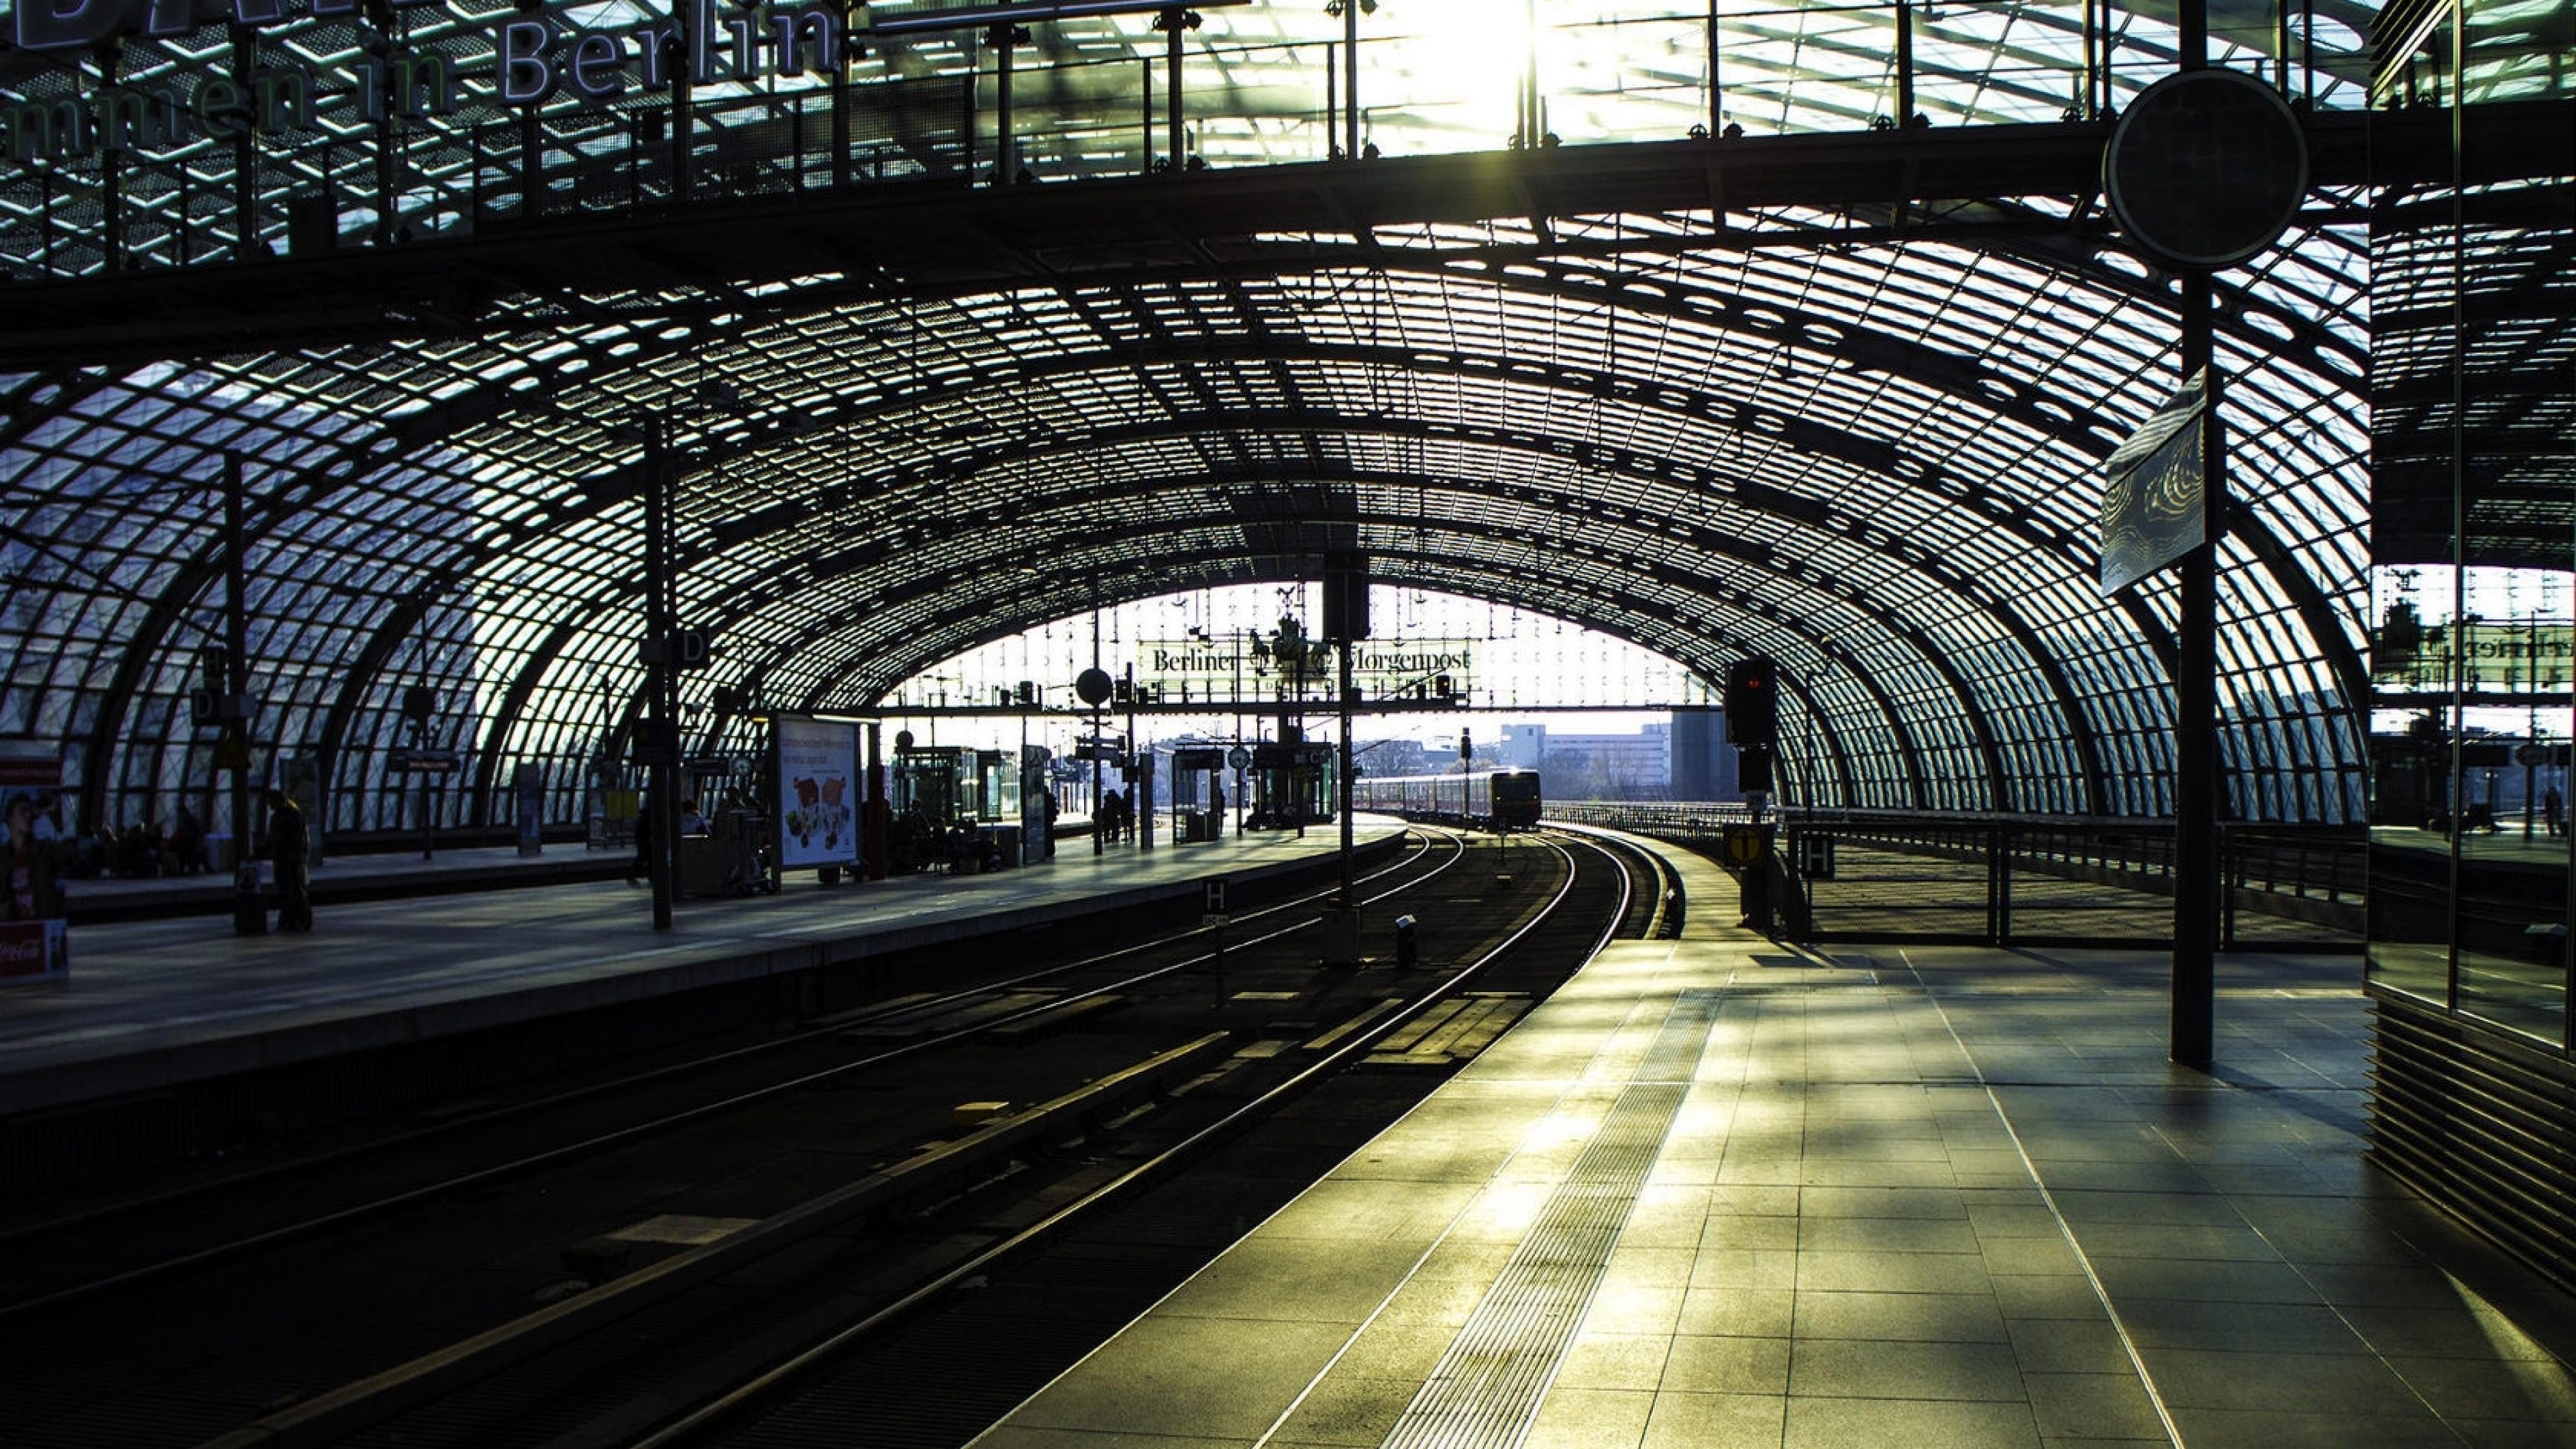 Wallpaper city, train, subway, station, track